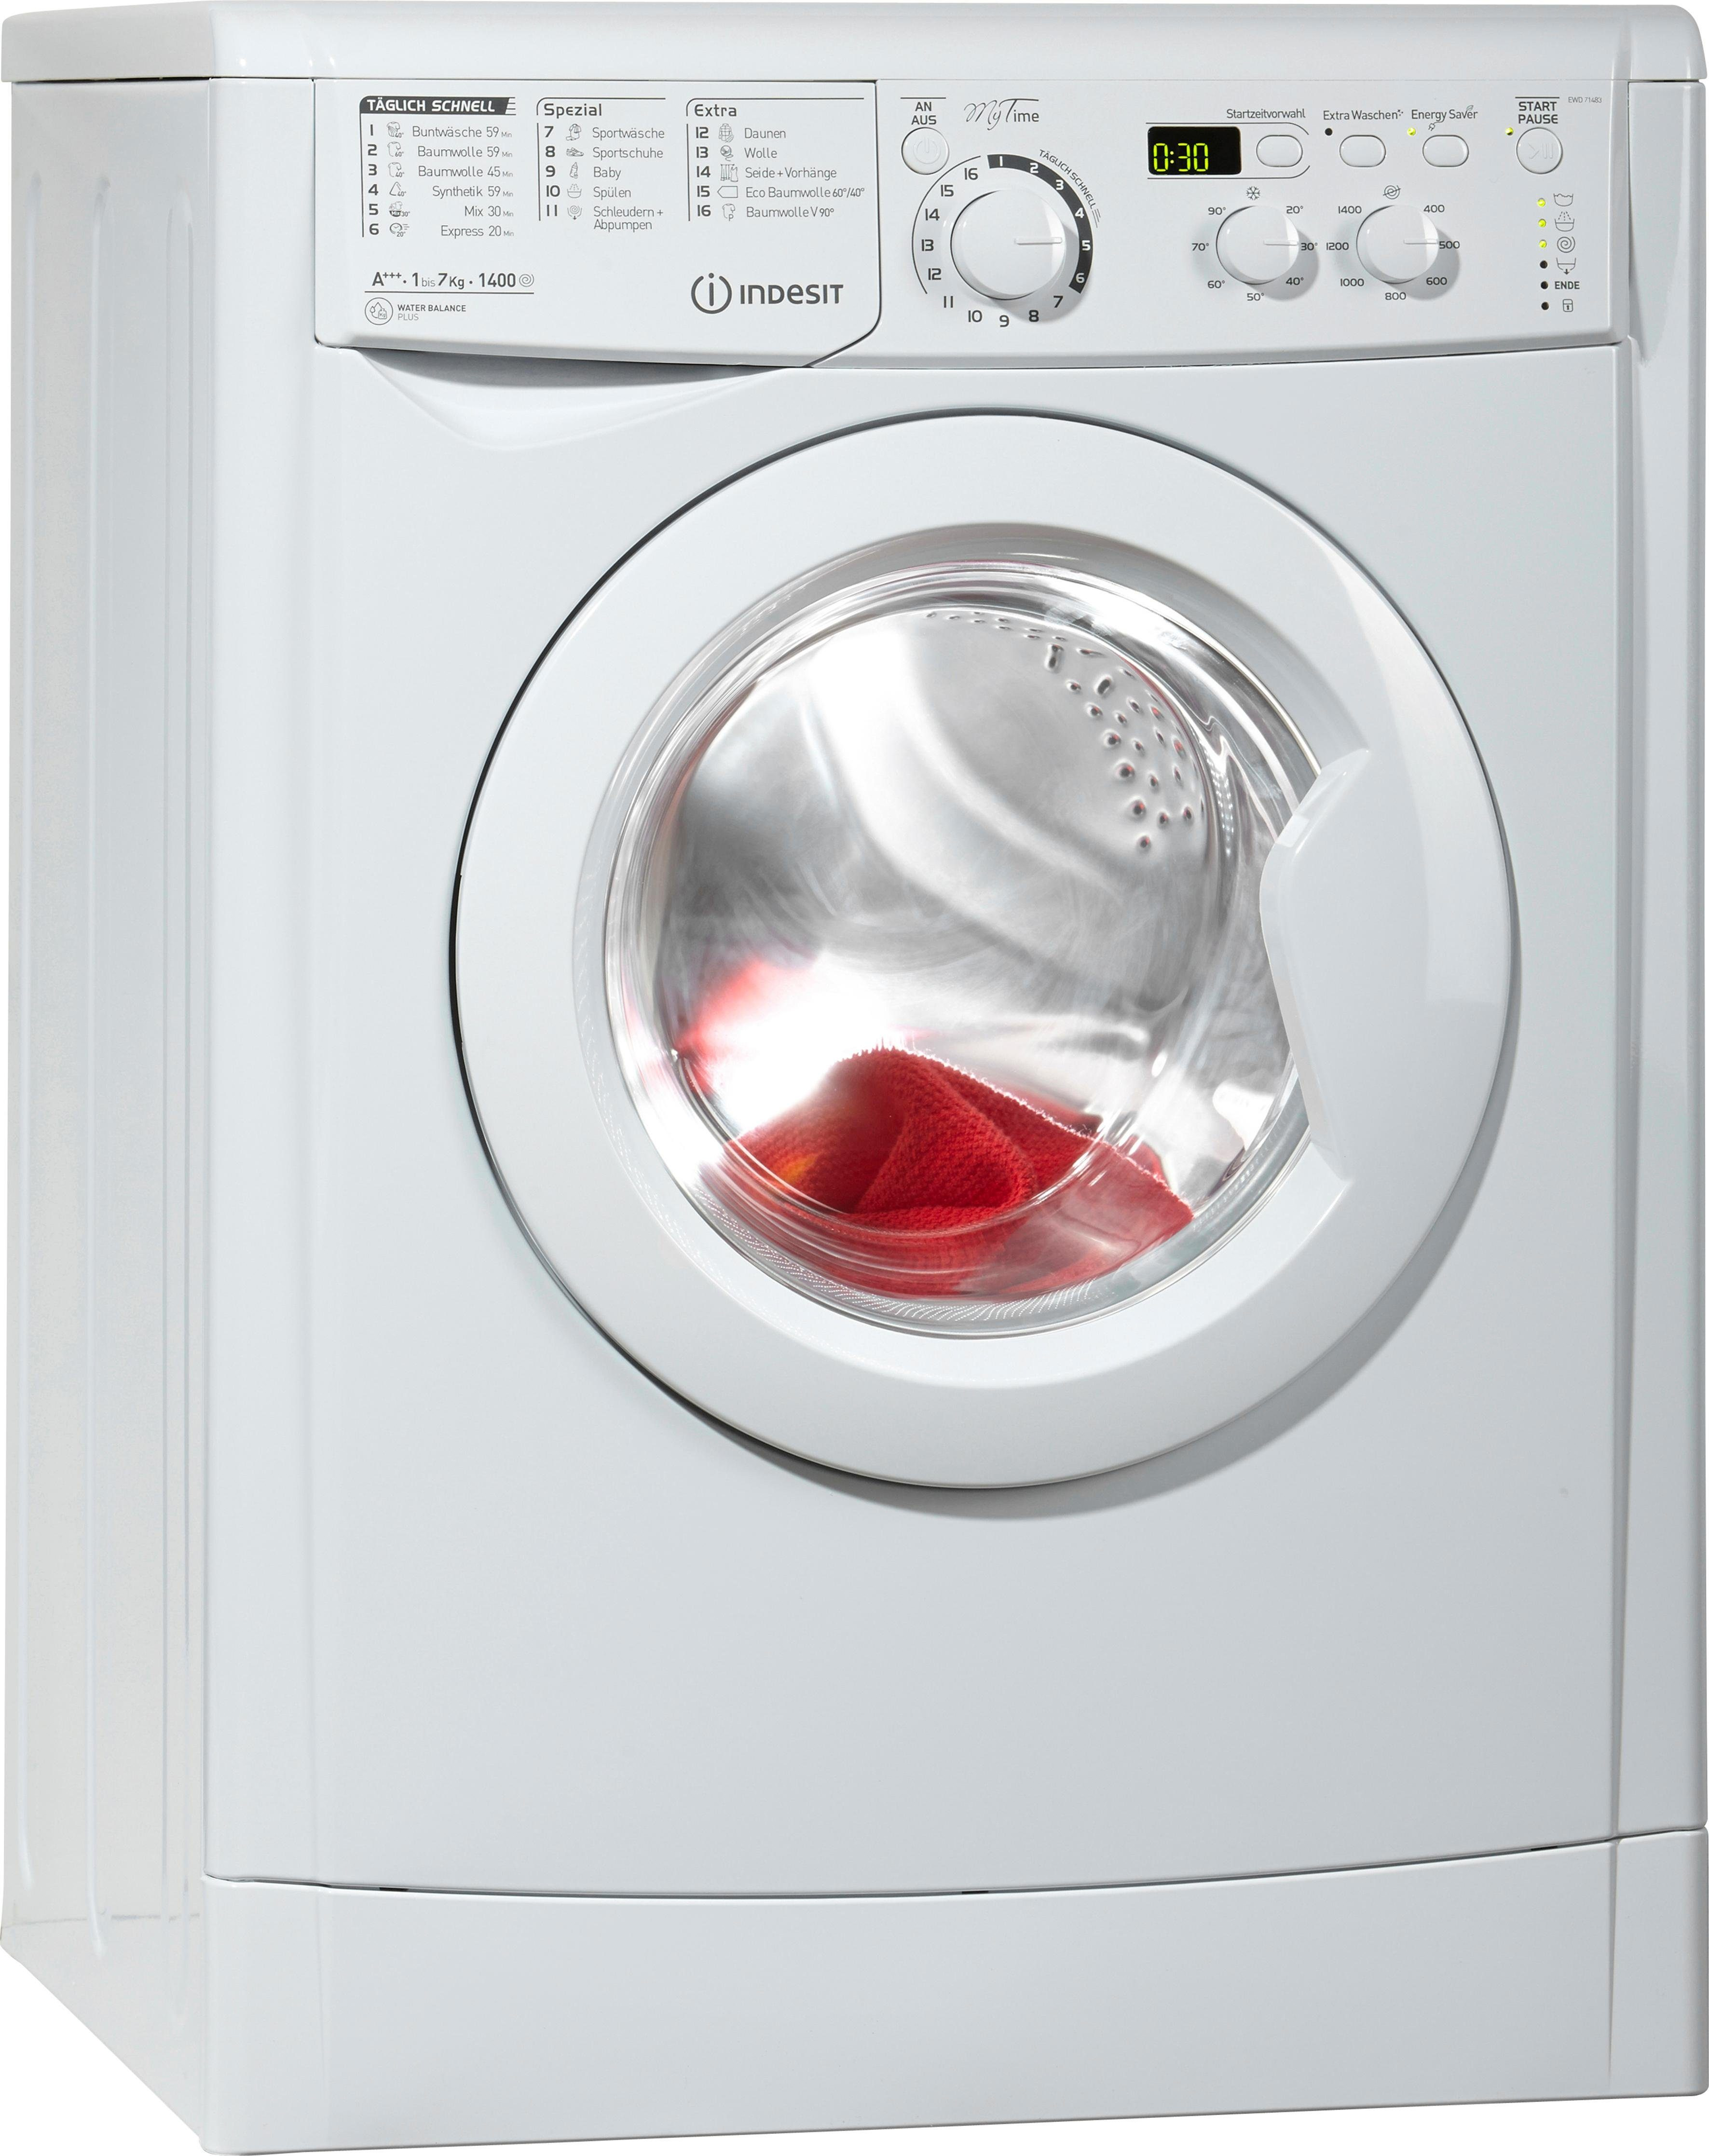 Indesit Waschmaschine EWD 71483 W DE, A+++, 7 kg, 1400 U/Min